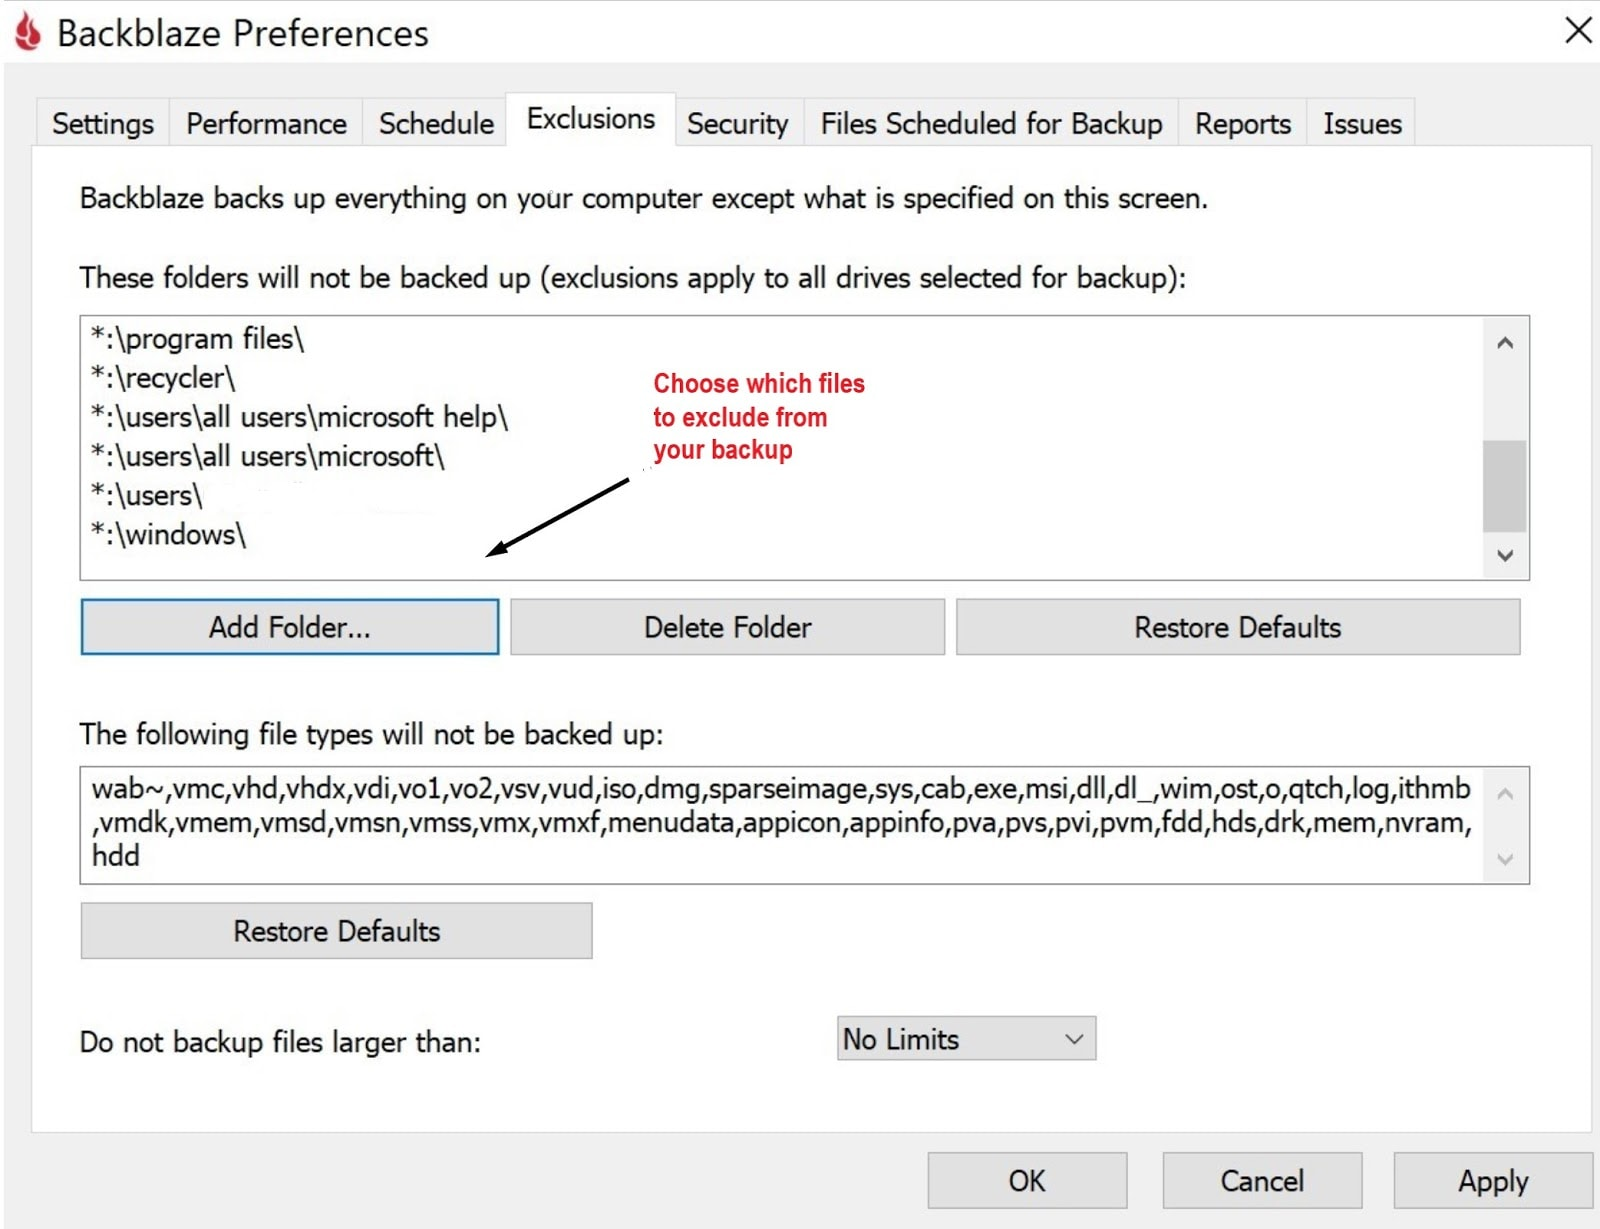 Backblaze preferences panel